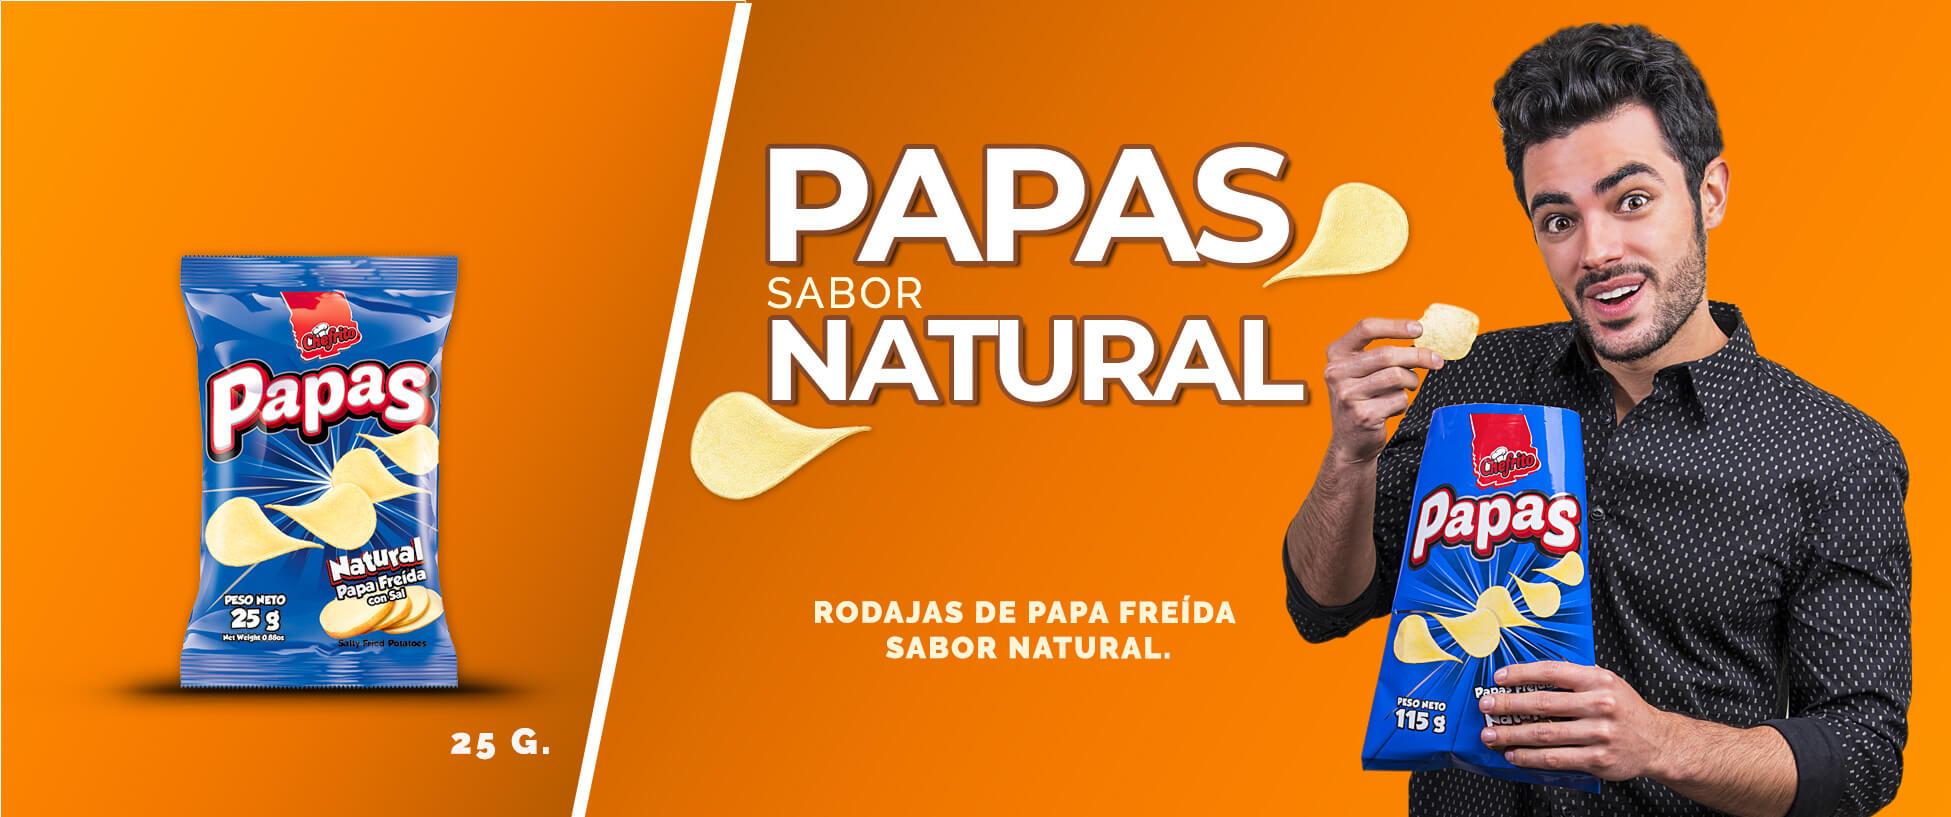 Papas 2